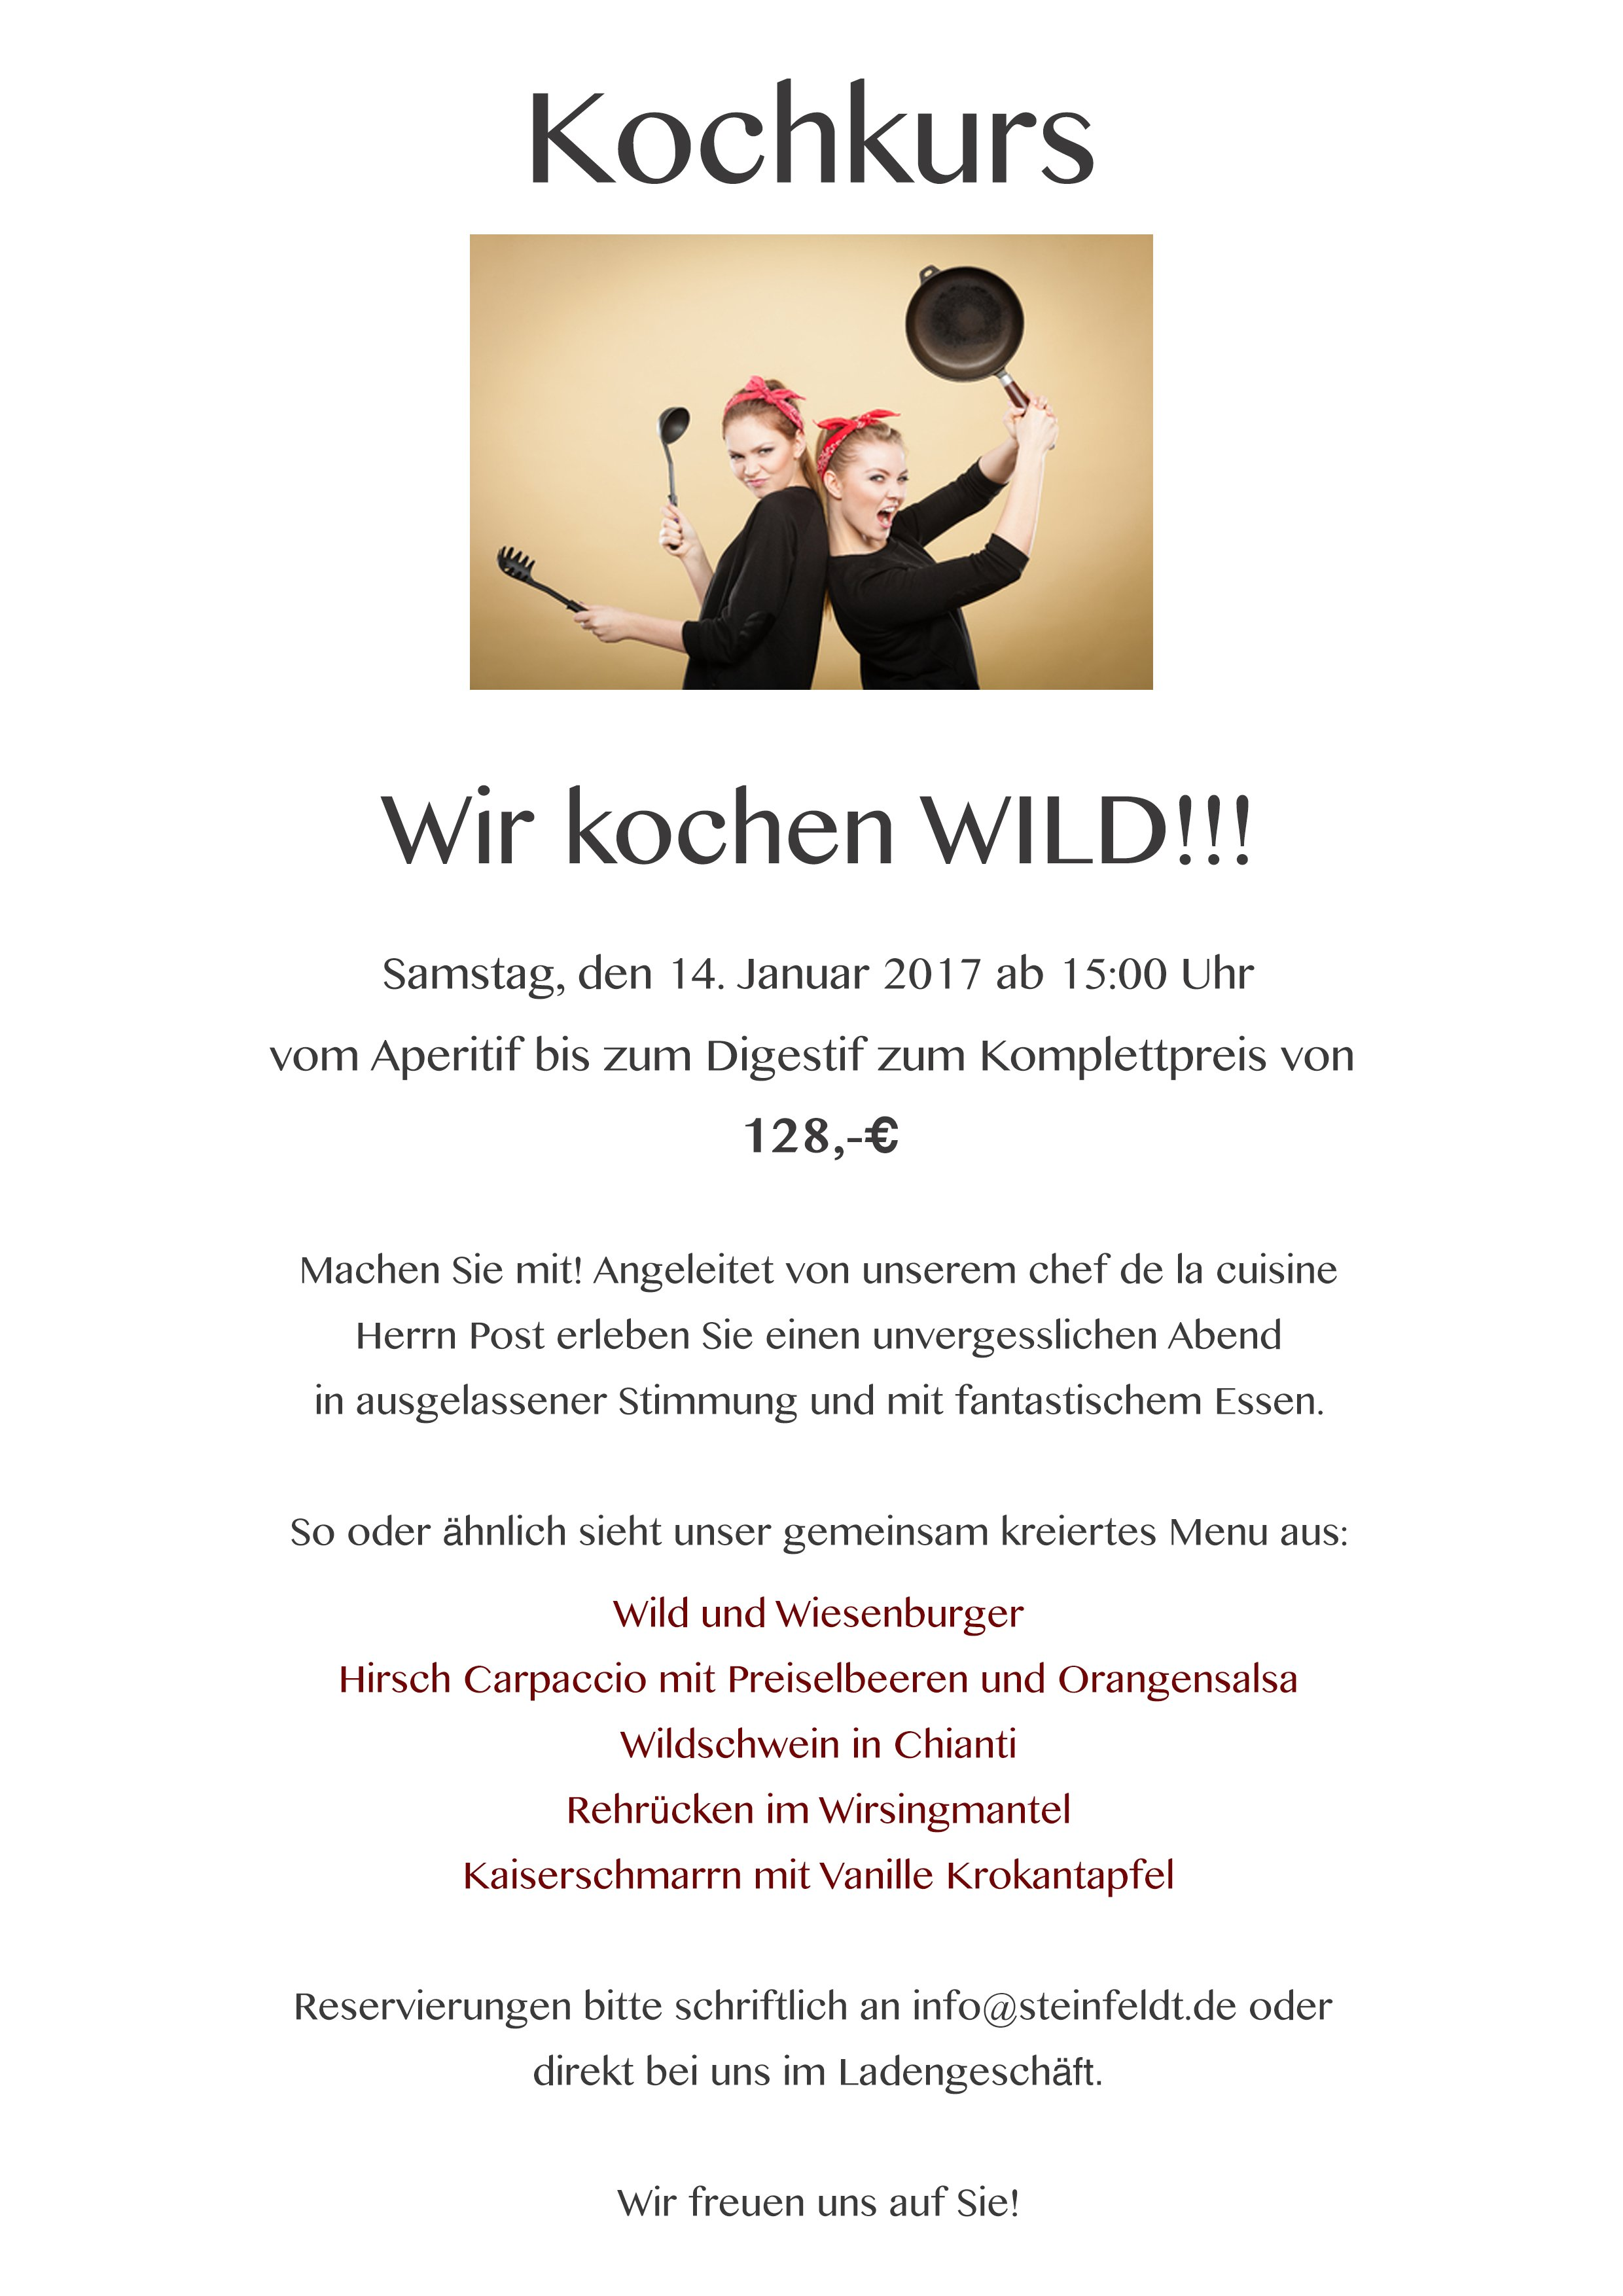 kochkurs_wild